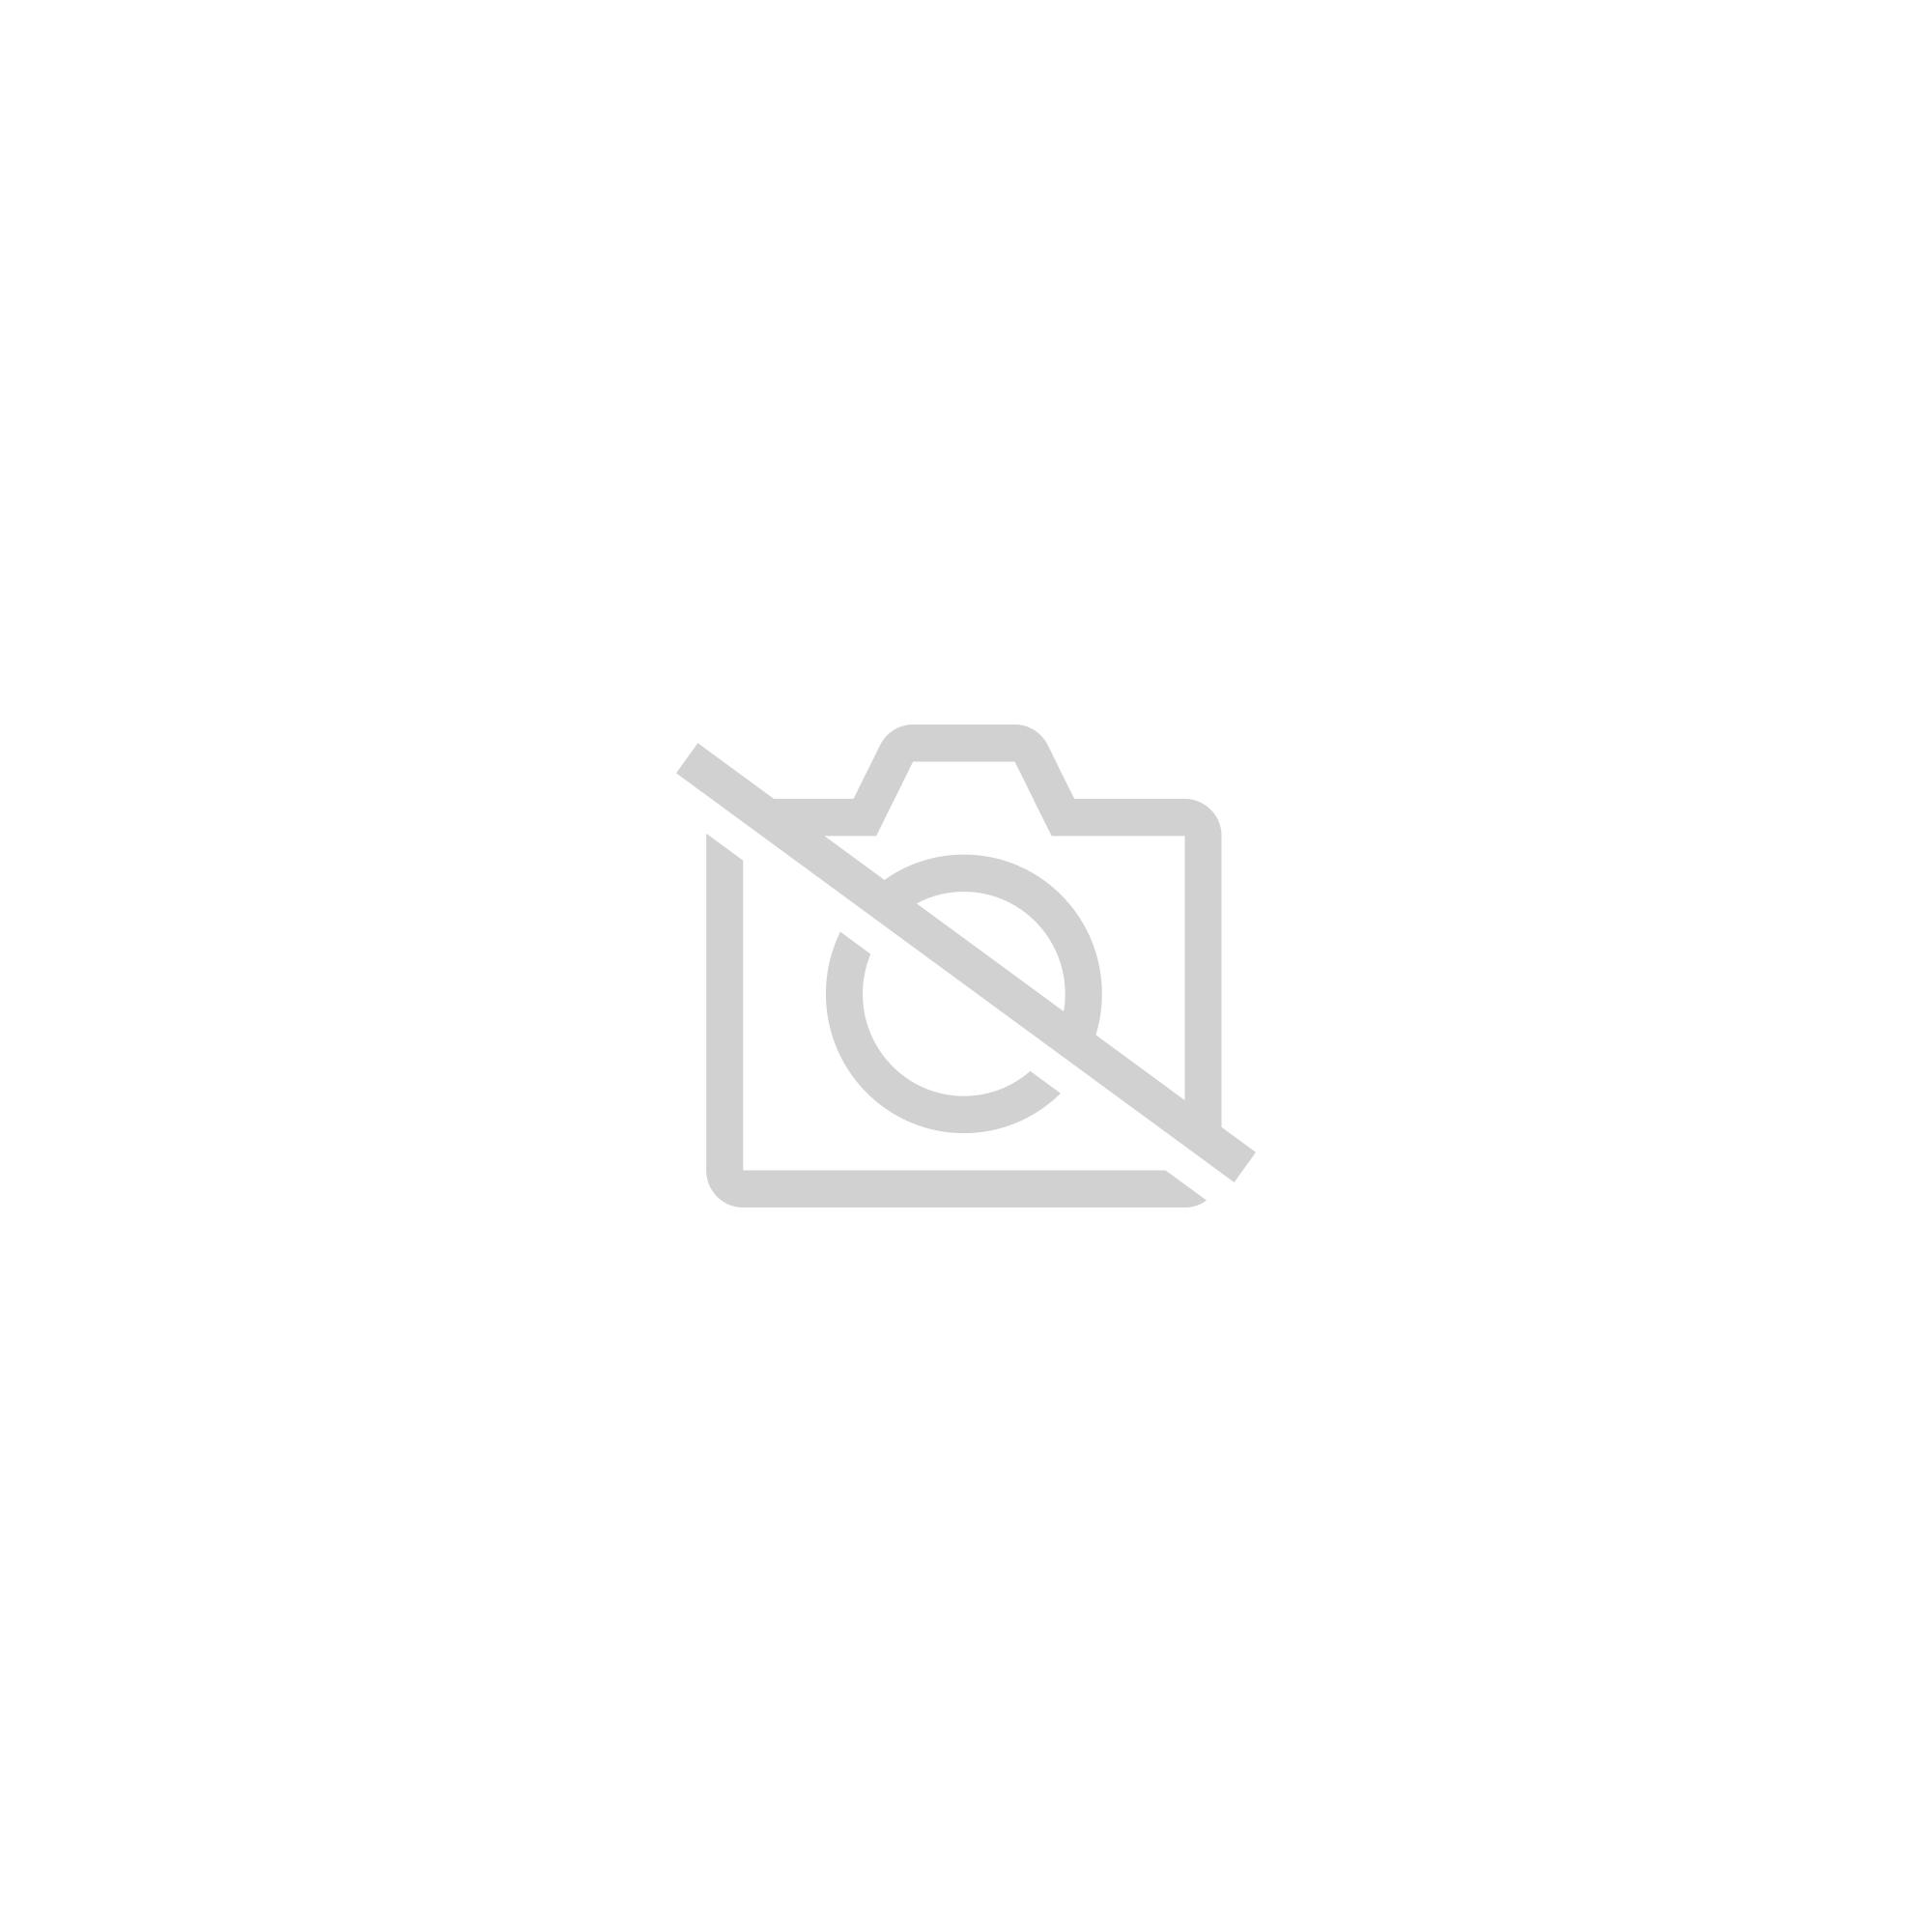 Assassin's Creed - Drapeau Skull (50x60)